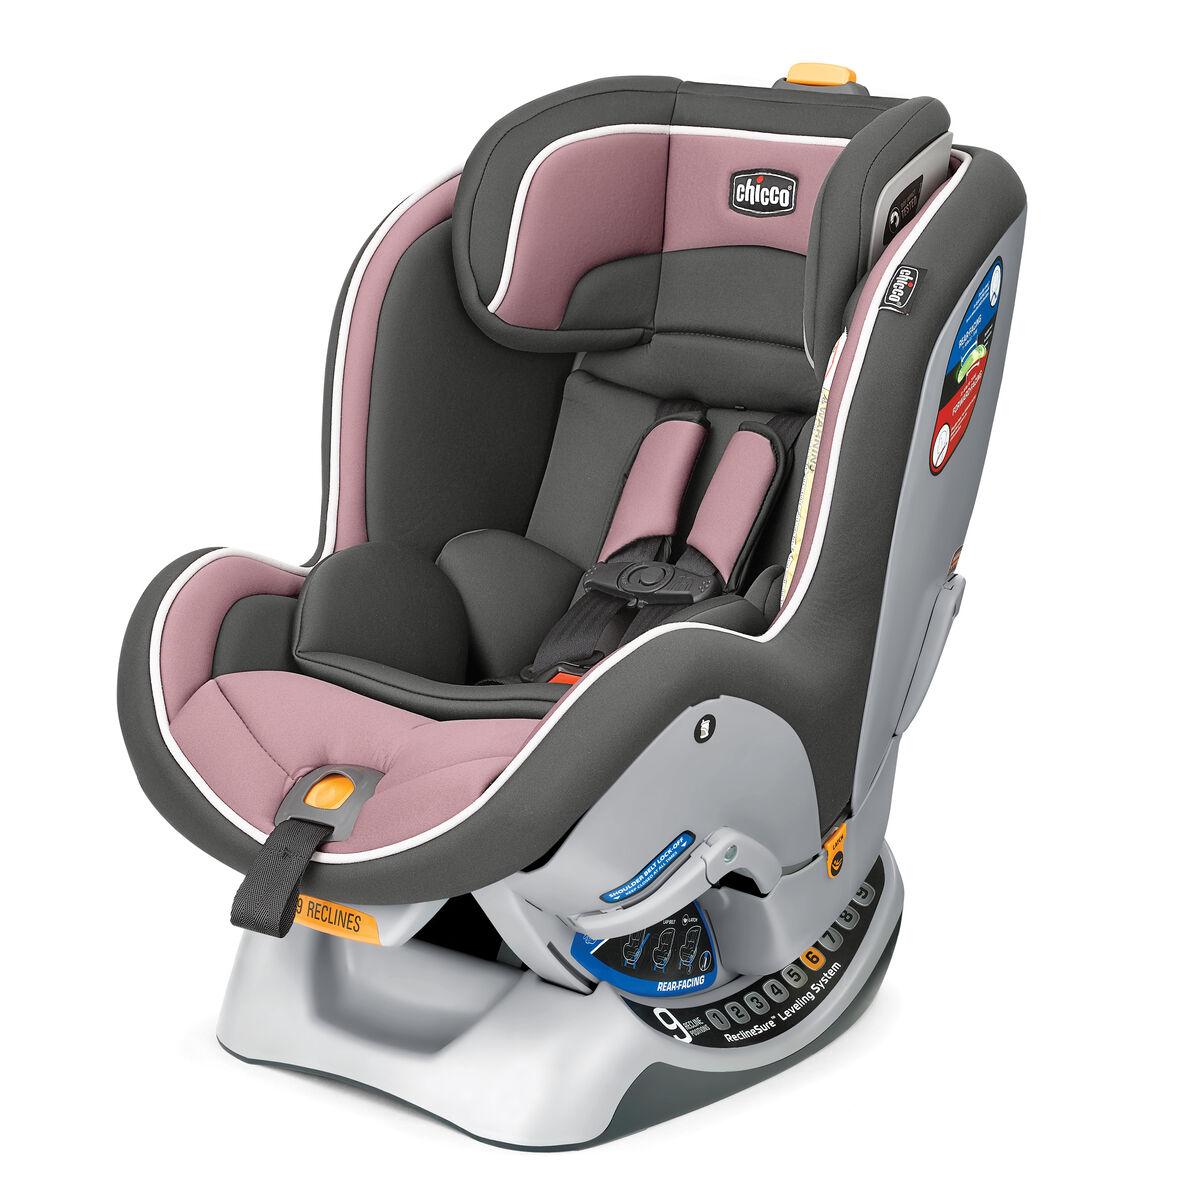 Nextfit convertible car seat rosenextfit convertible car seat rose